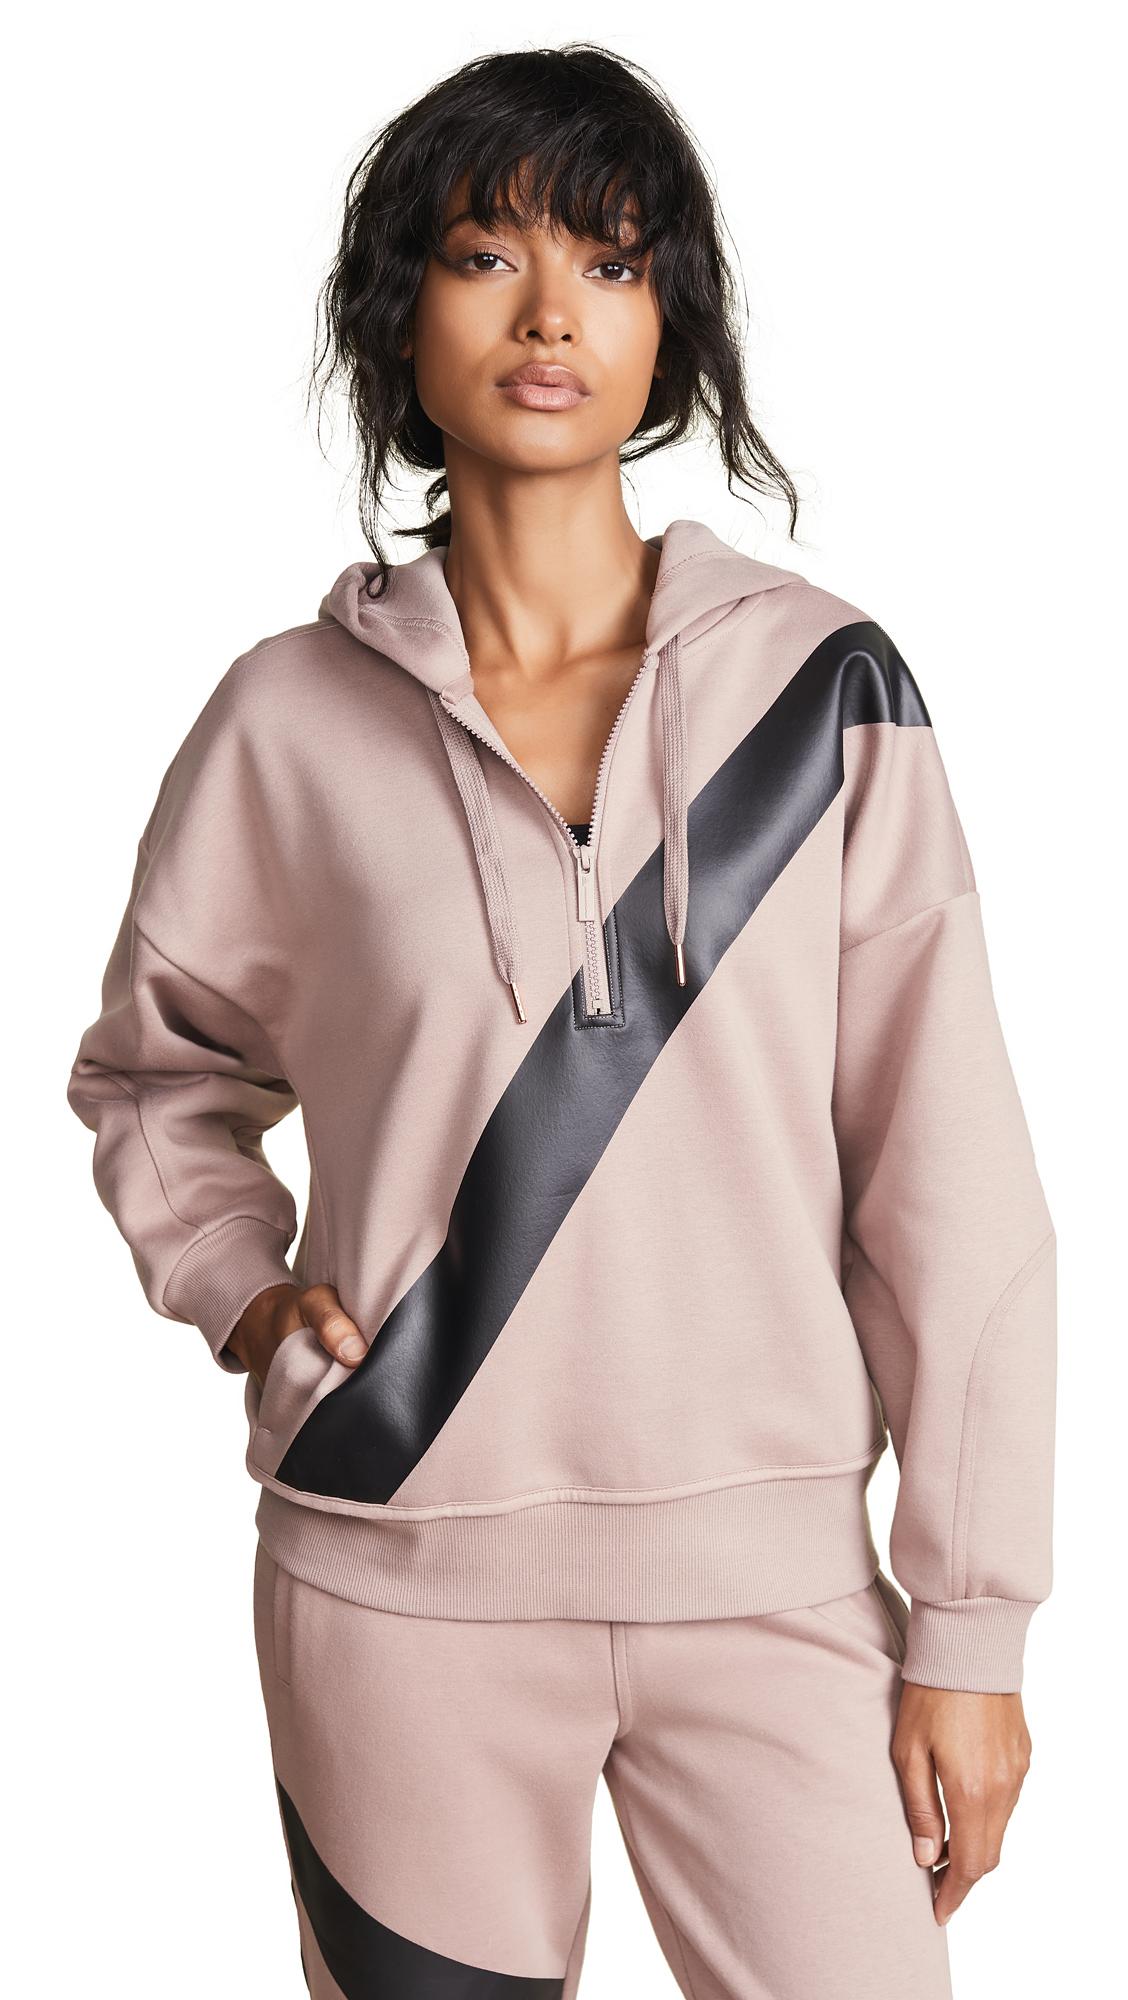 adidas by Stella McCartney Yoga Comfort Hoodie In Smoked Pink